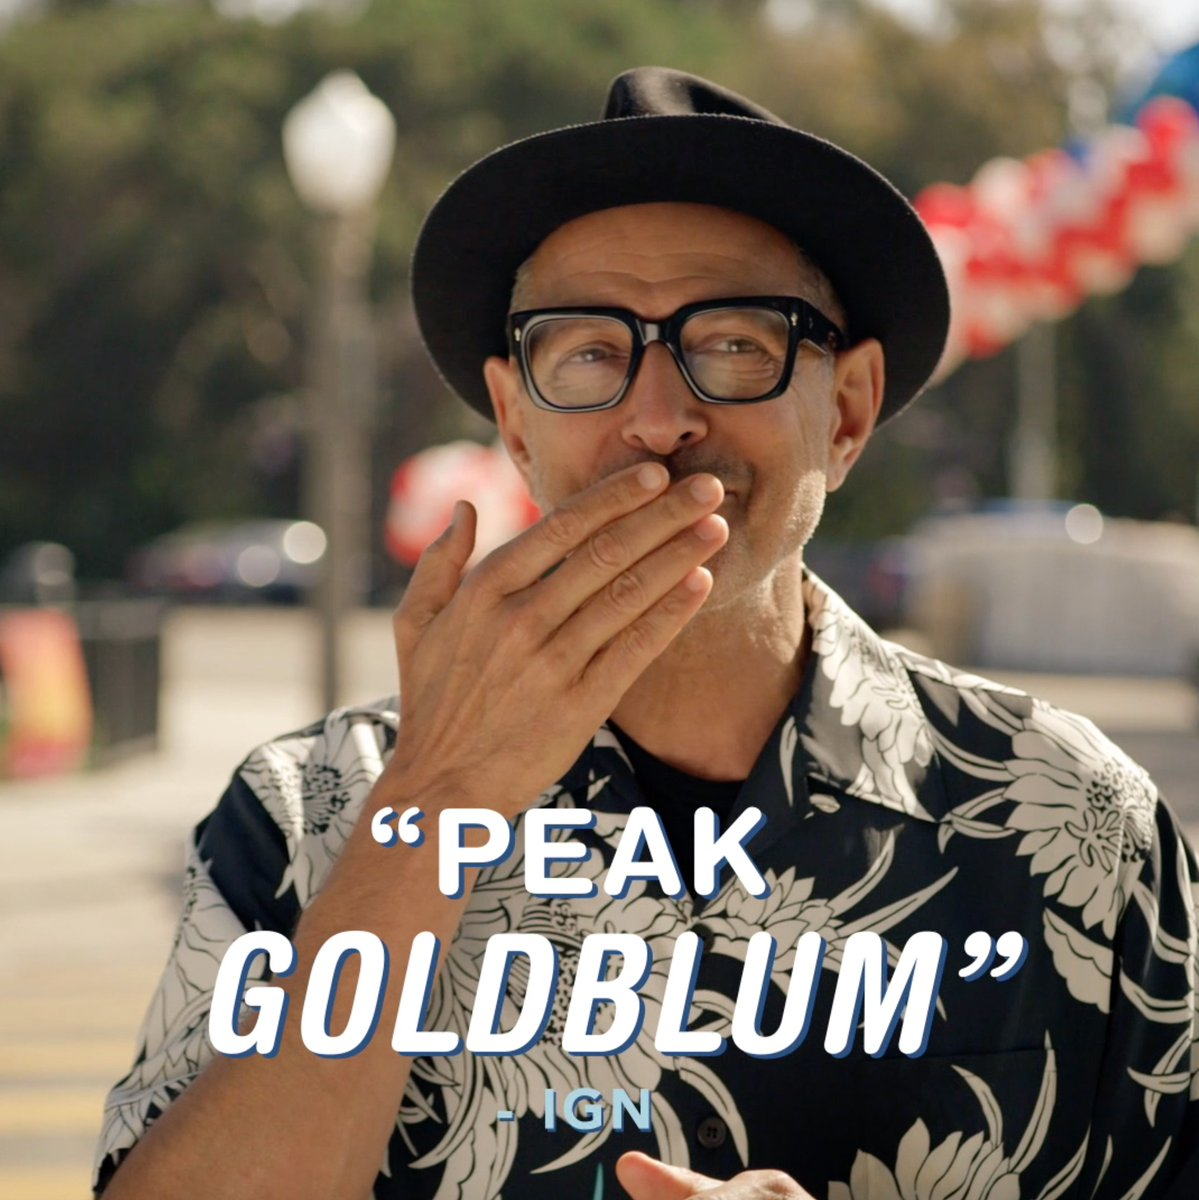 Good as Goldblum according to critics! 🌟 Pique your curiosity with #TheWorldAccordingToJeffGoldblum, now streaming on #DisneyPlus.